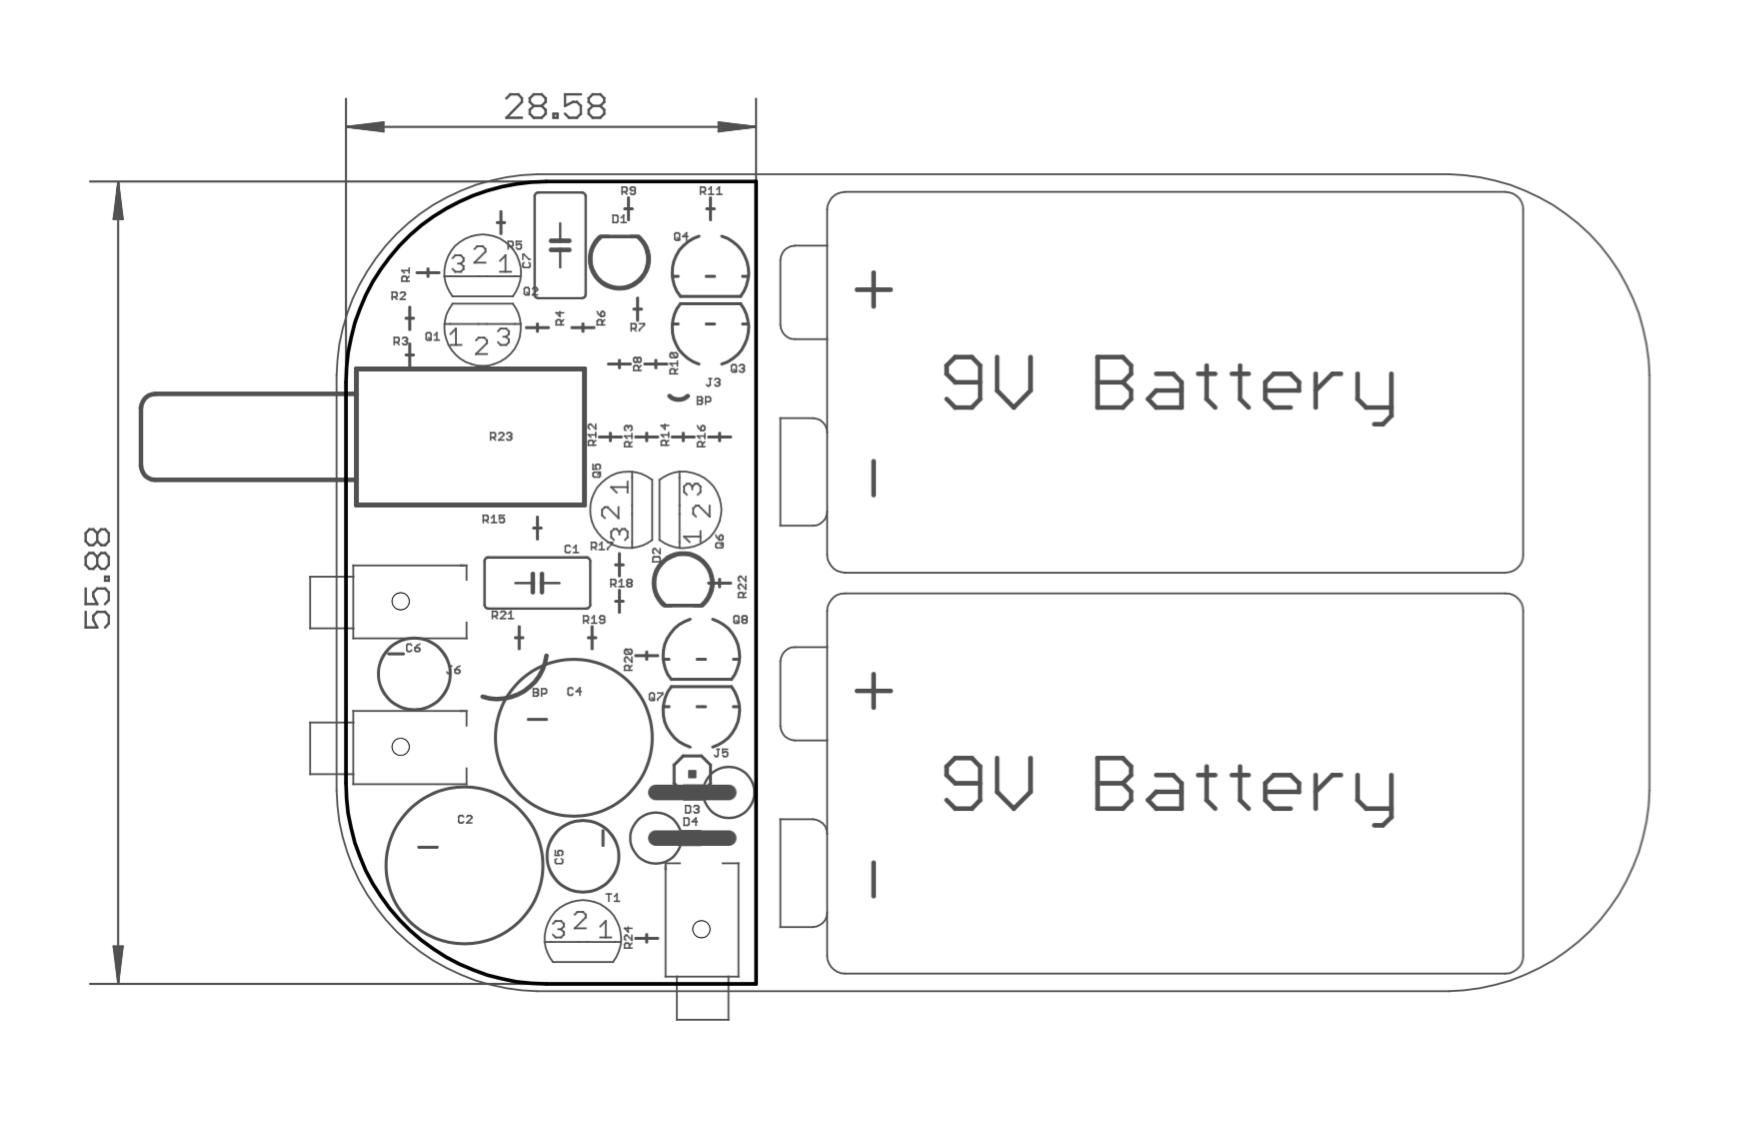 Altoids Amp Diagram Explained Wiring Diagrams Hifi Blog For Diy Audiophiles Grado Ra1 Headphone Amplifier Tin Of Fets Sized Not A Cmoy Variation Mint